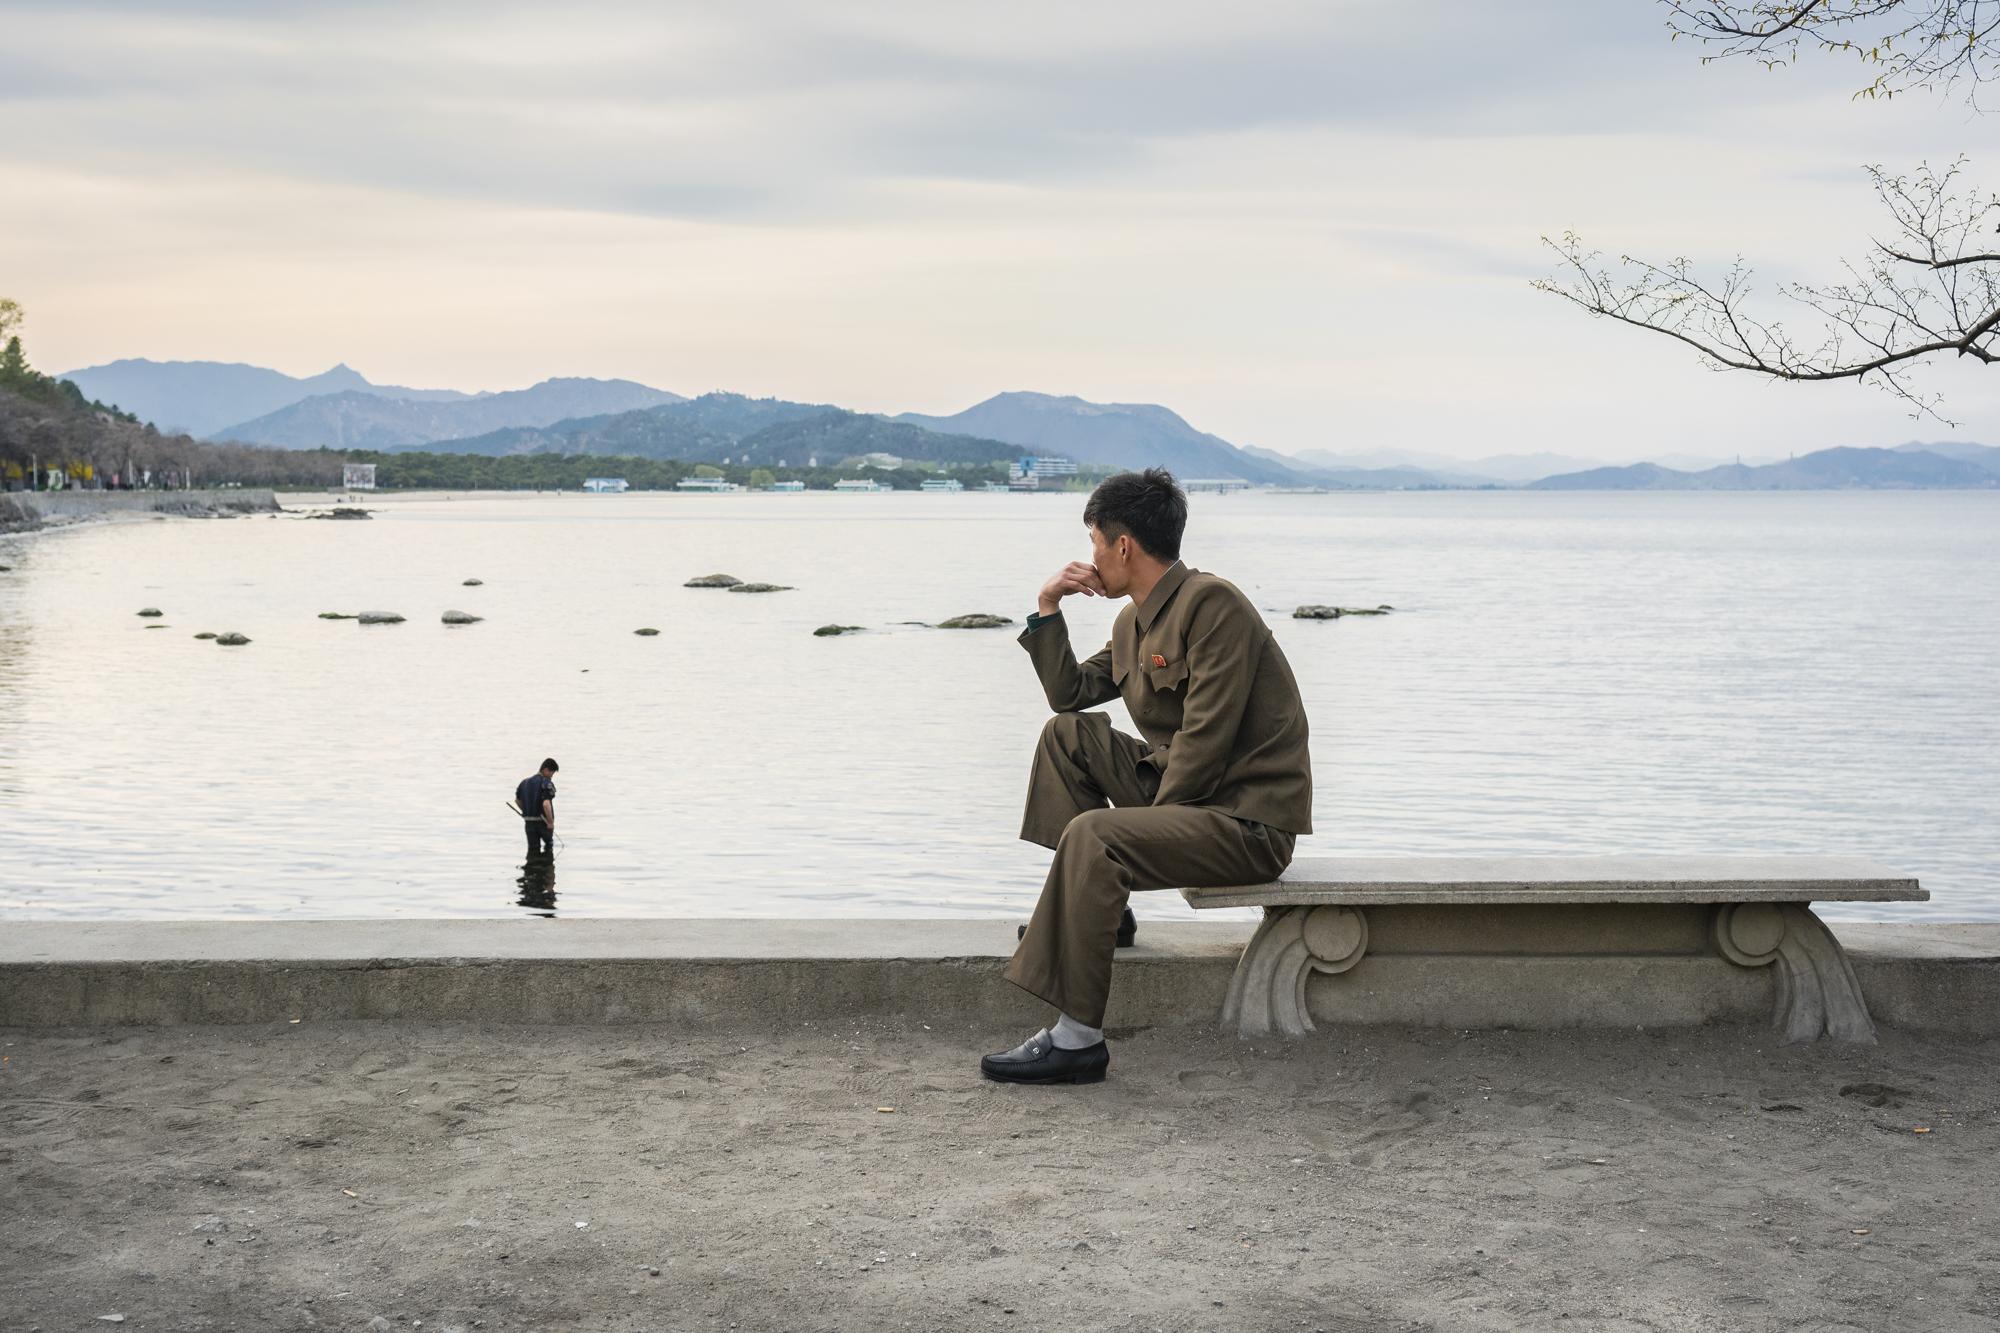 NorthKorea_160419_SNY2719_Web.jpg